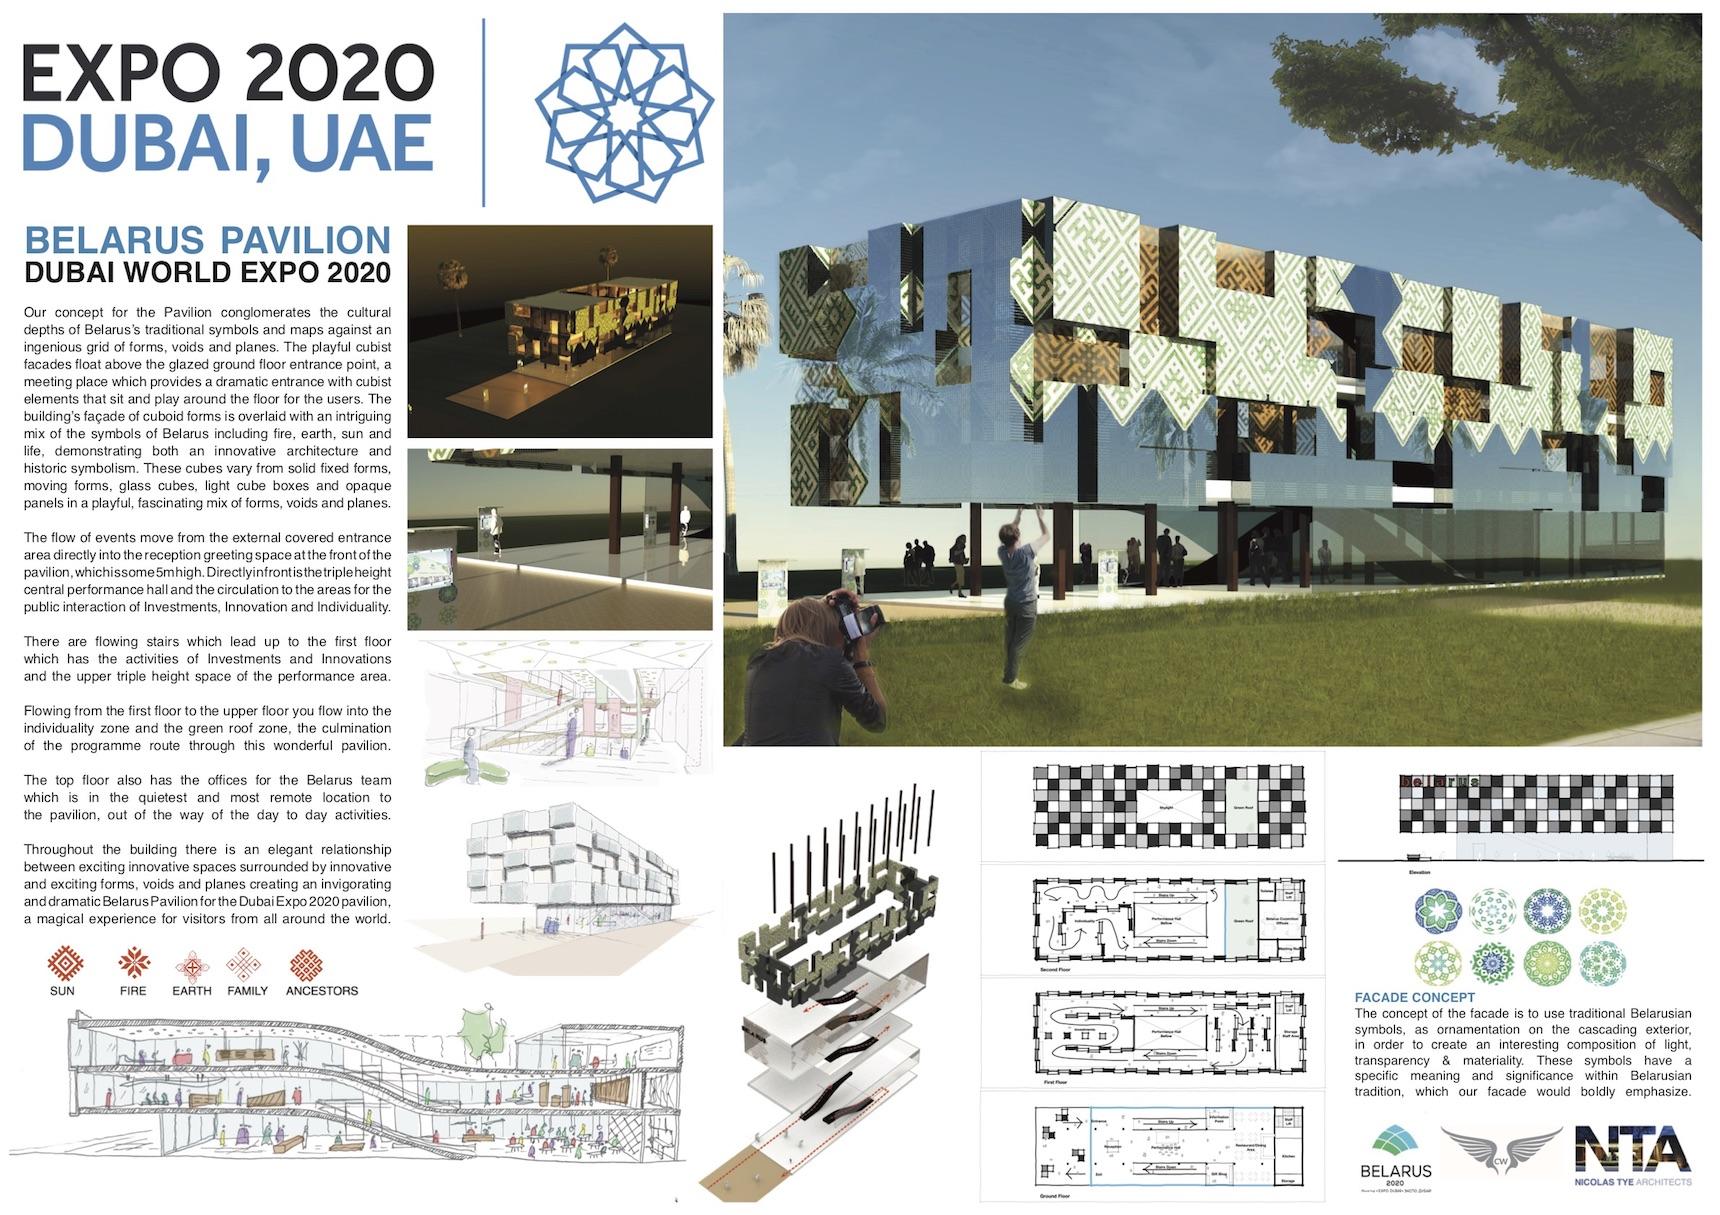 Belarus Pavilion in Dubai 2020